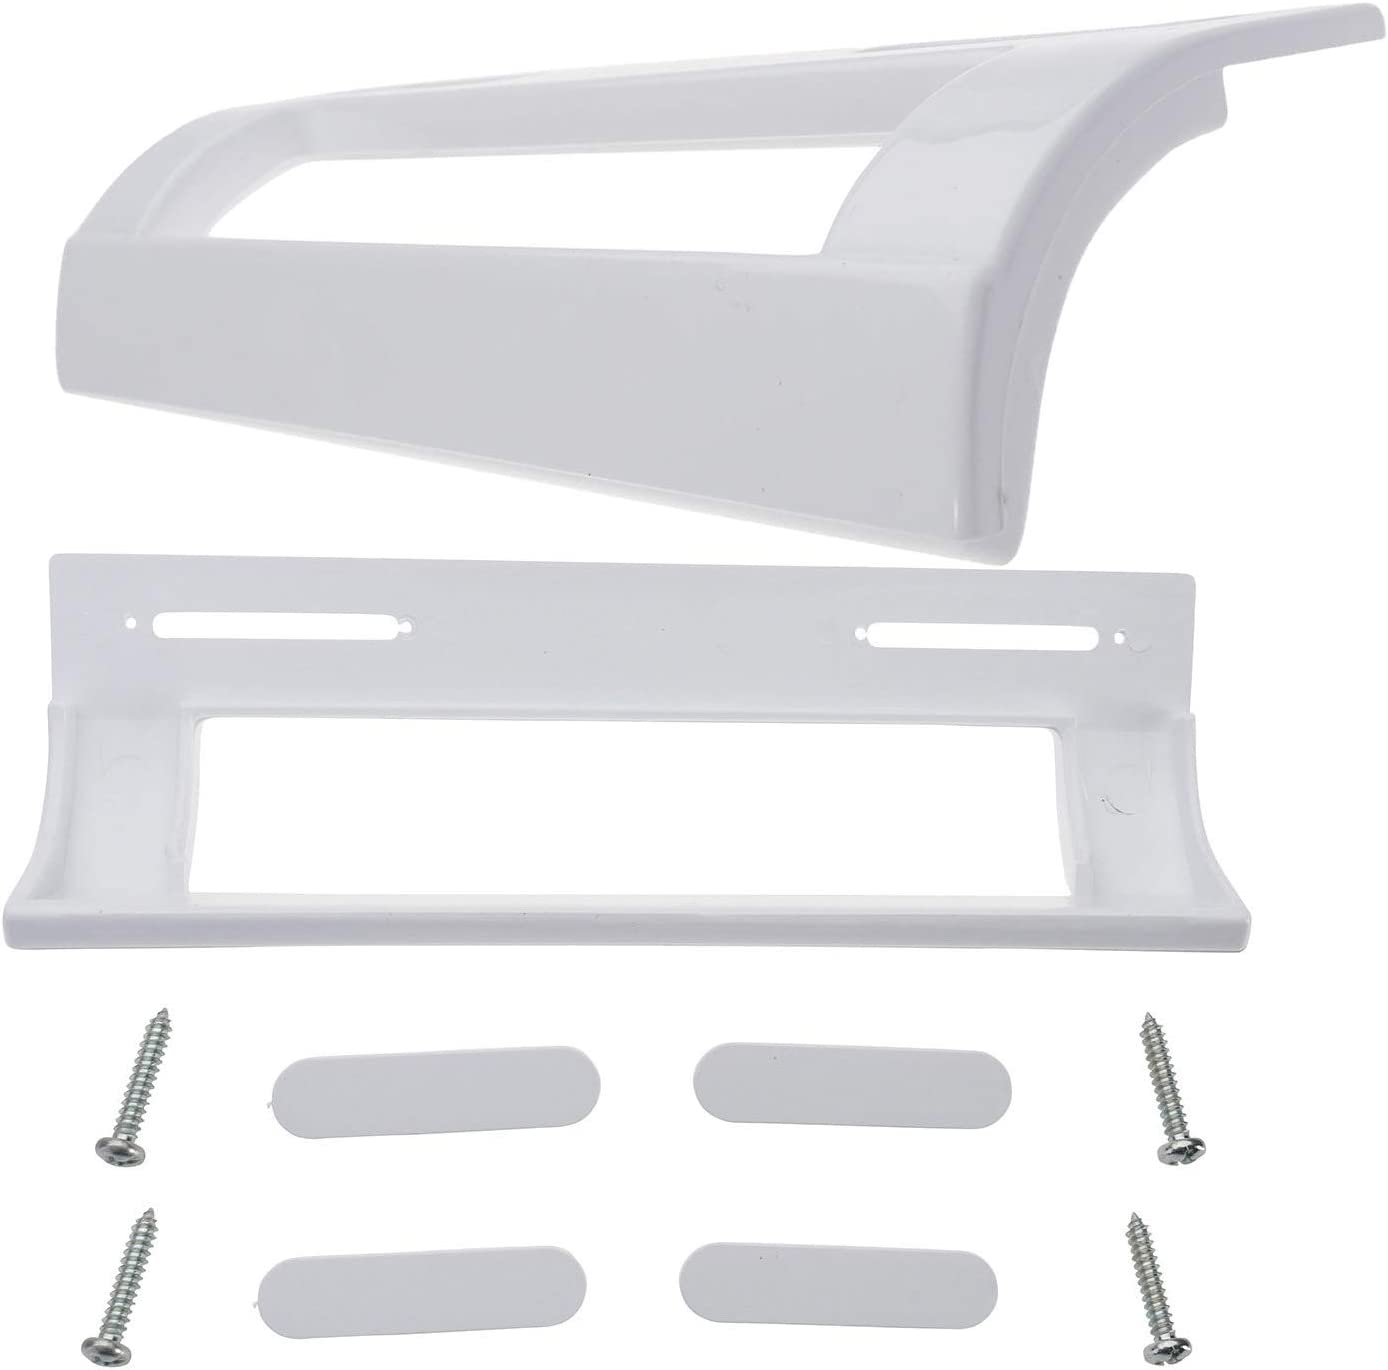 RELIAPART - Tirador Universal Ajustable para Puerta de frigorífico ...